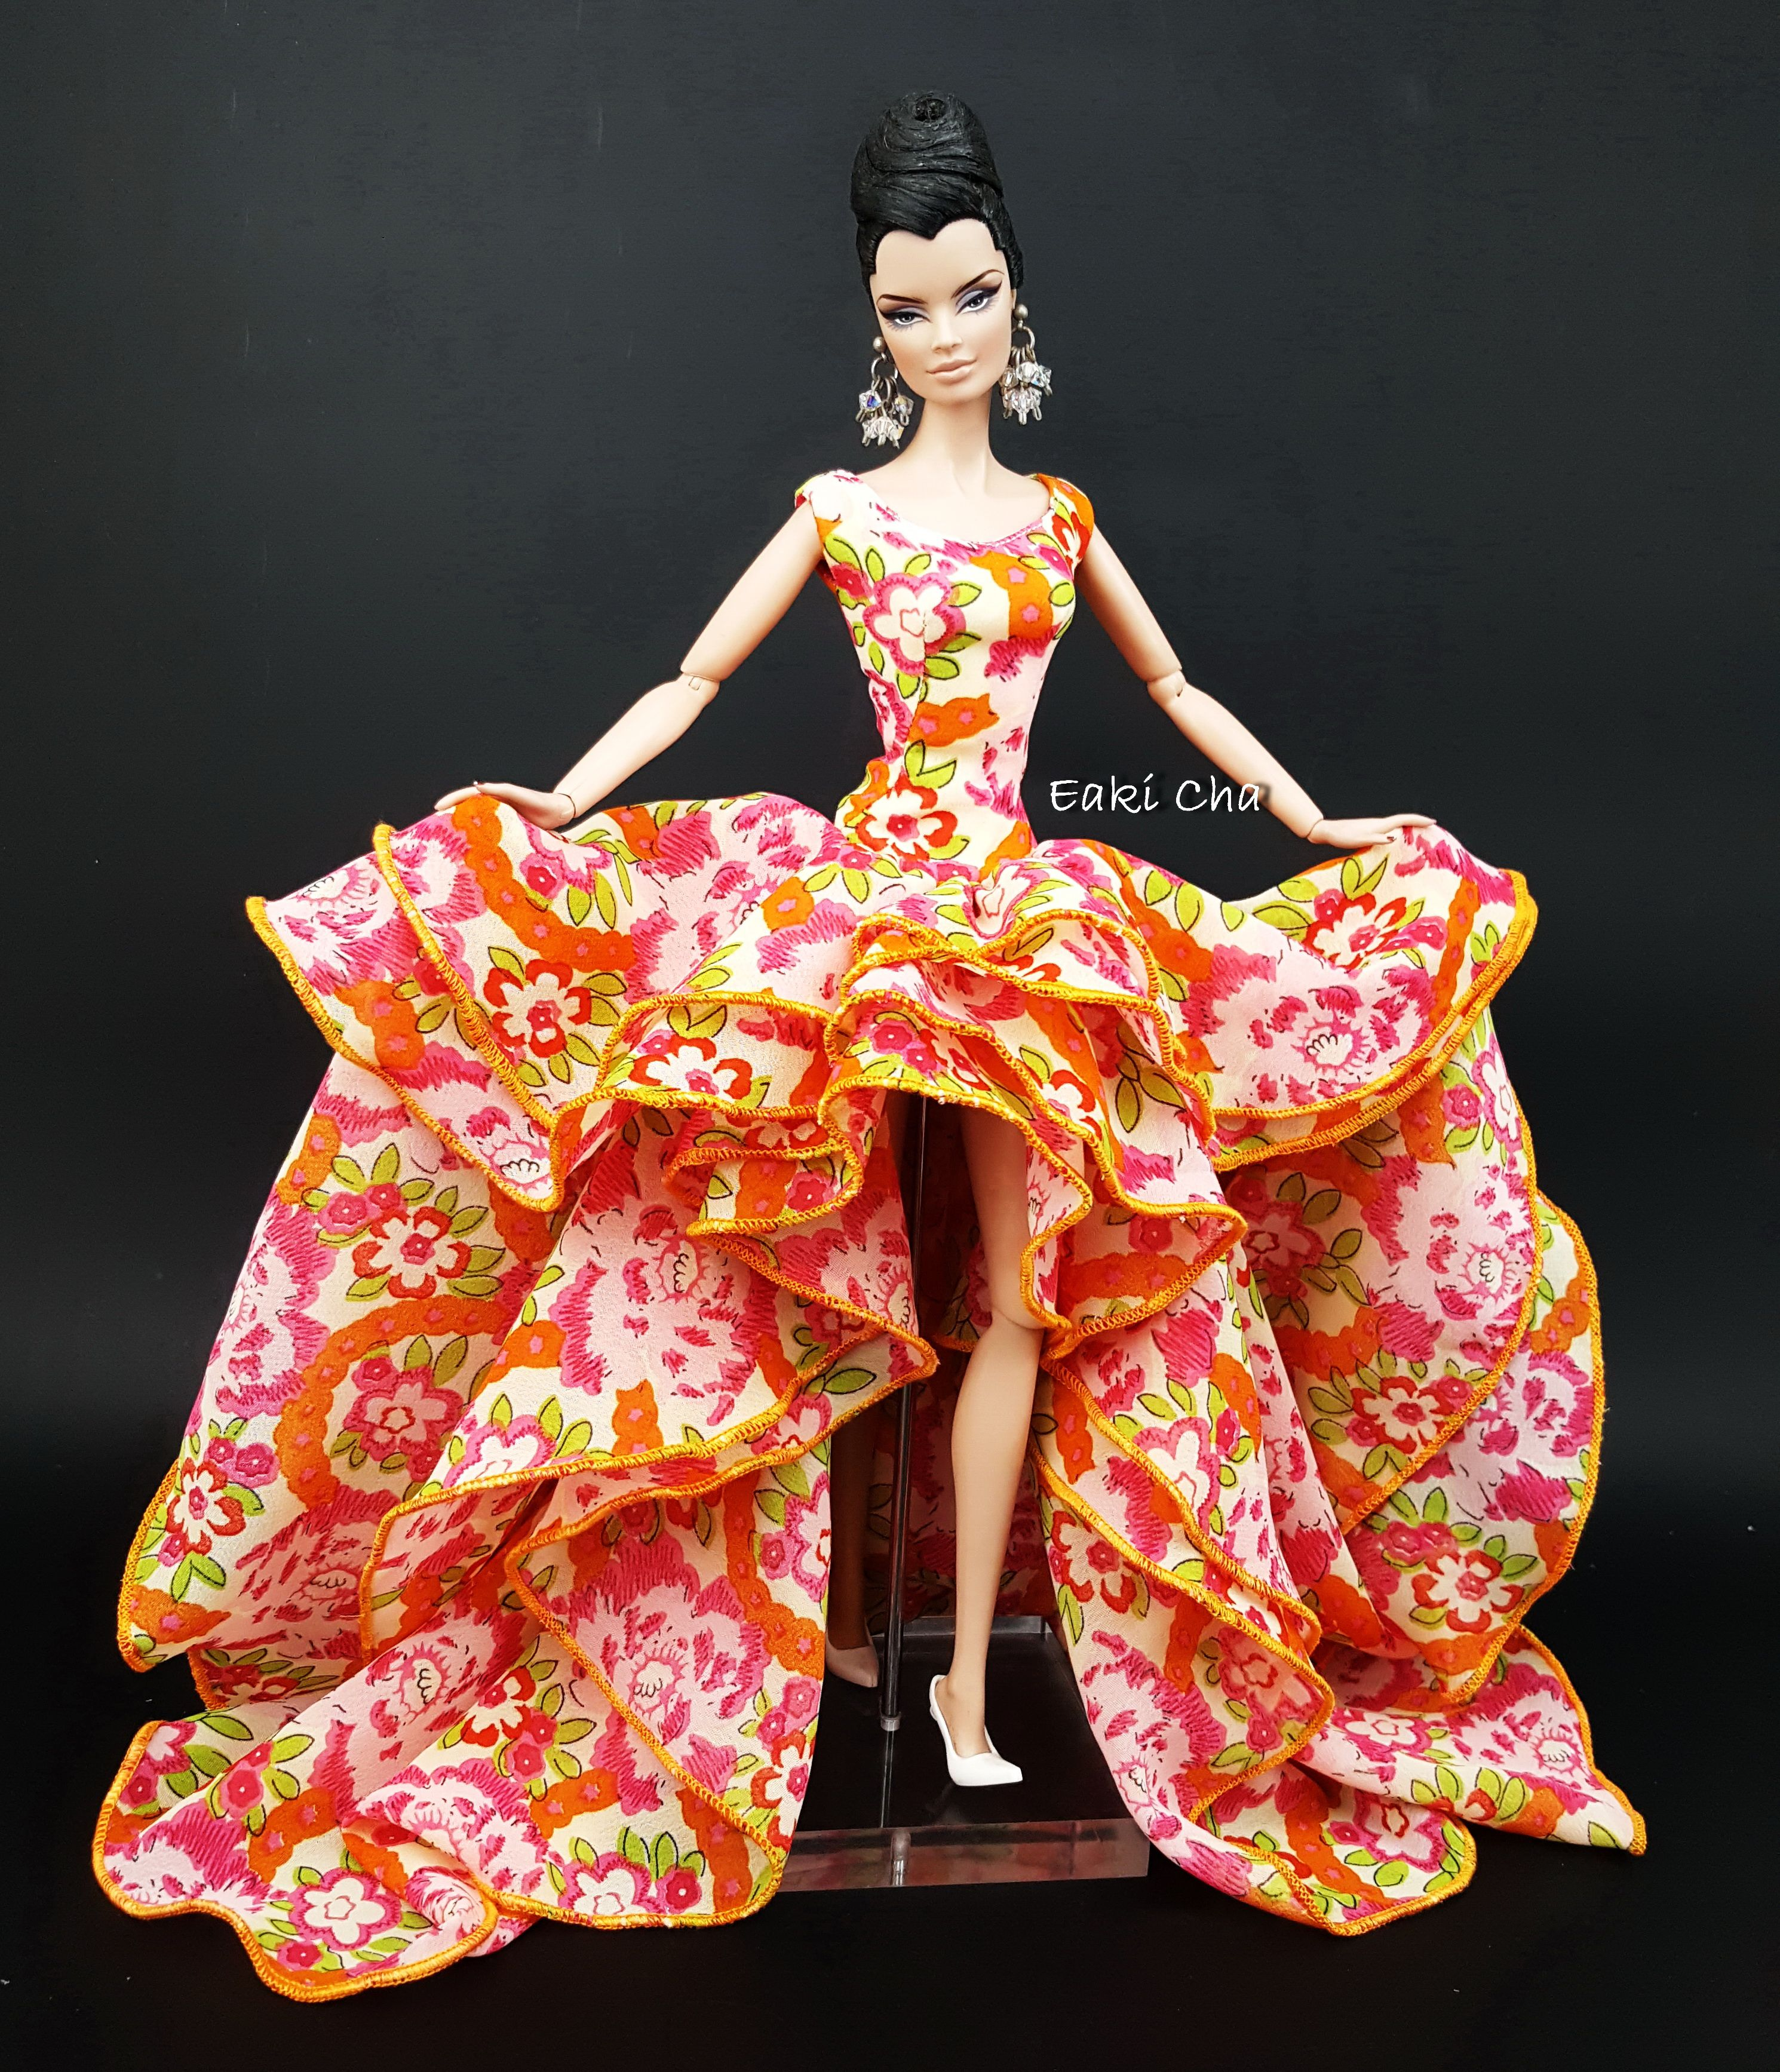 Eaki Black Chiffon Evening Dress Outfit Gown Fits Silkstone Fashion Royalty FR